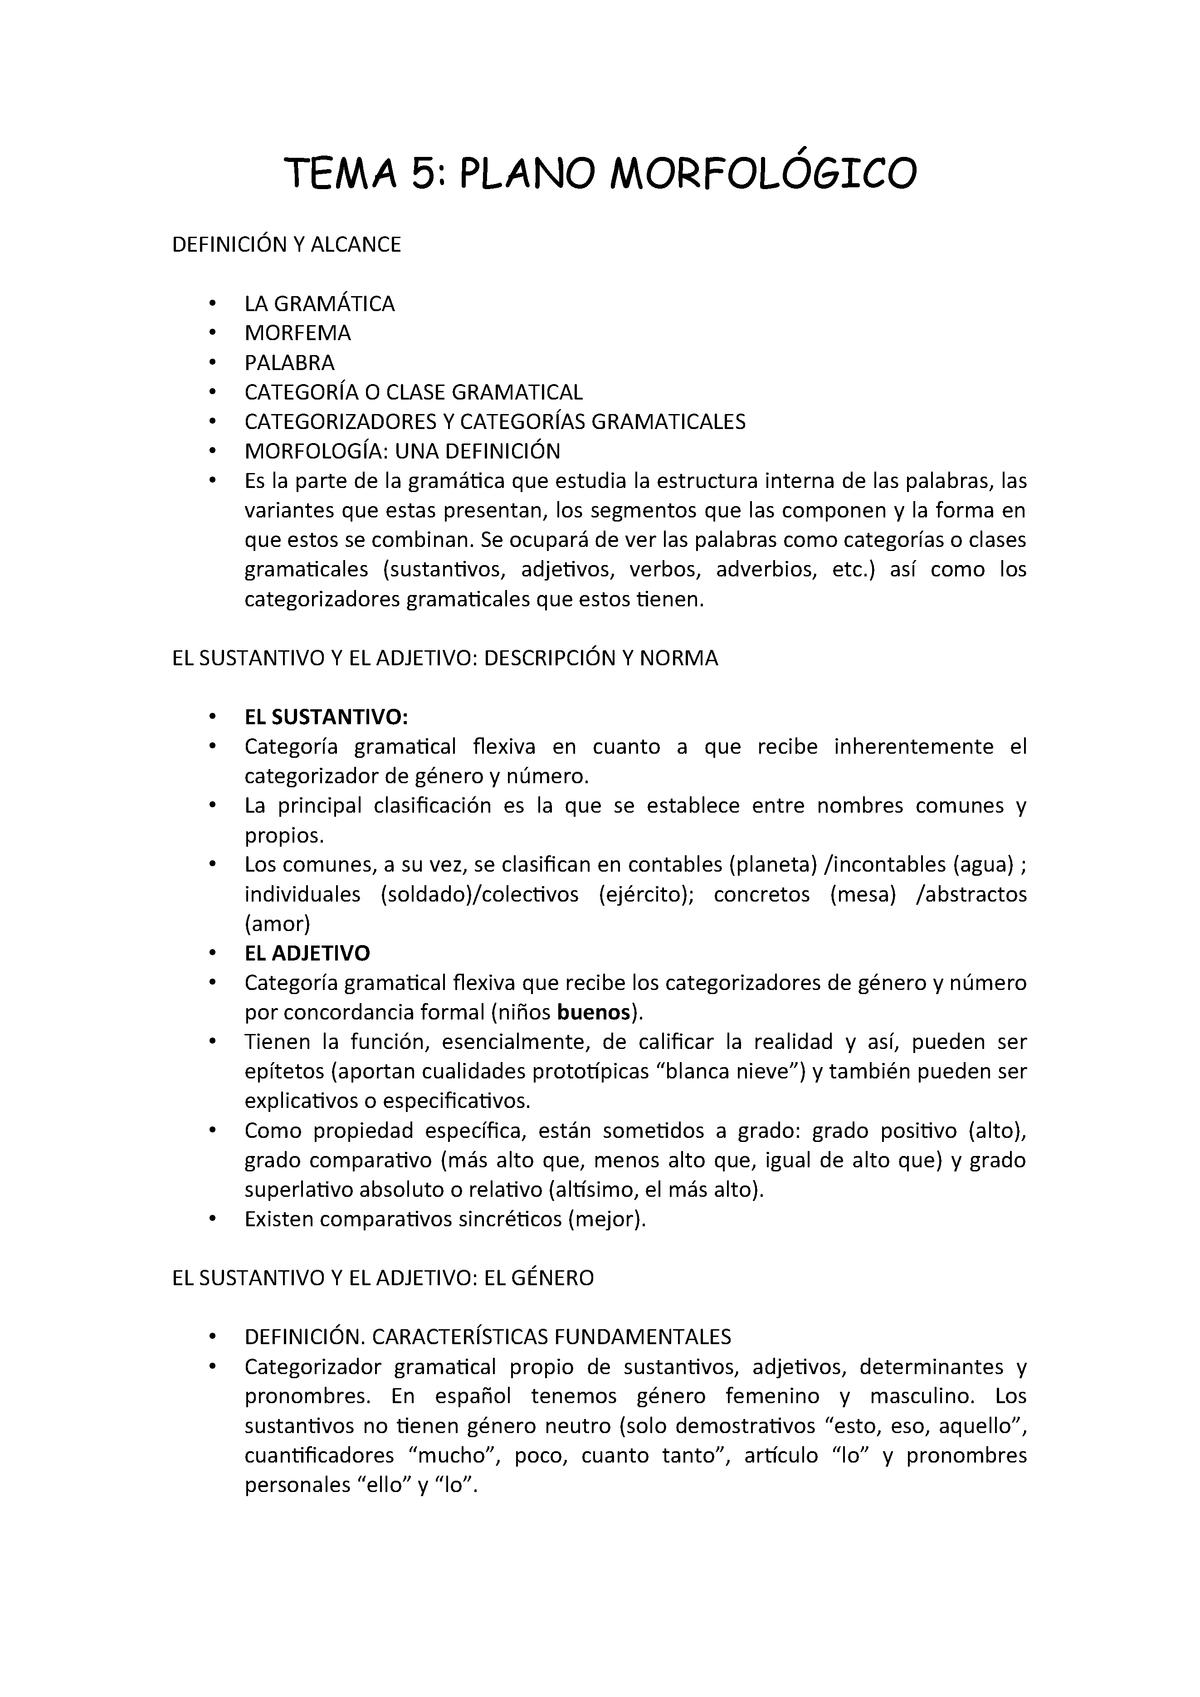 Tema 5 Lengua Apuntes 5 32077 Studocu